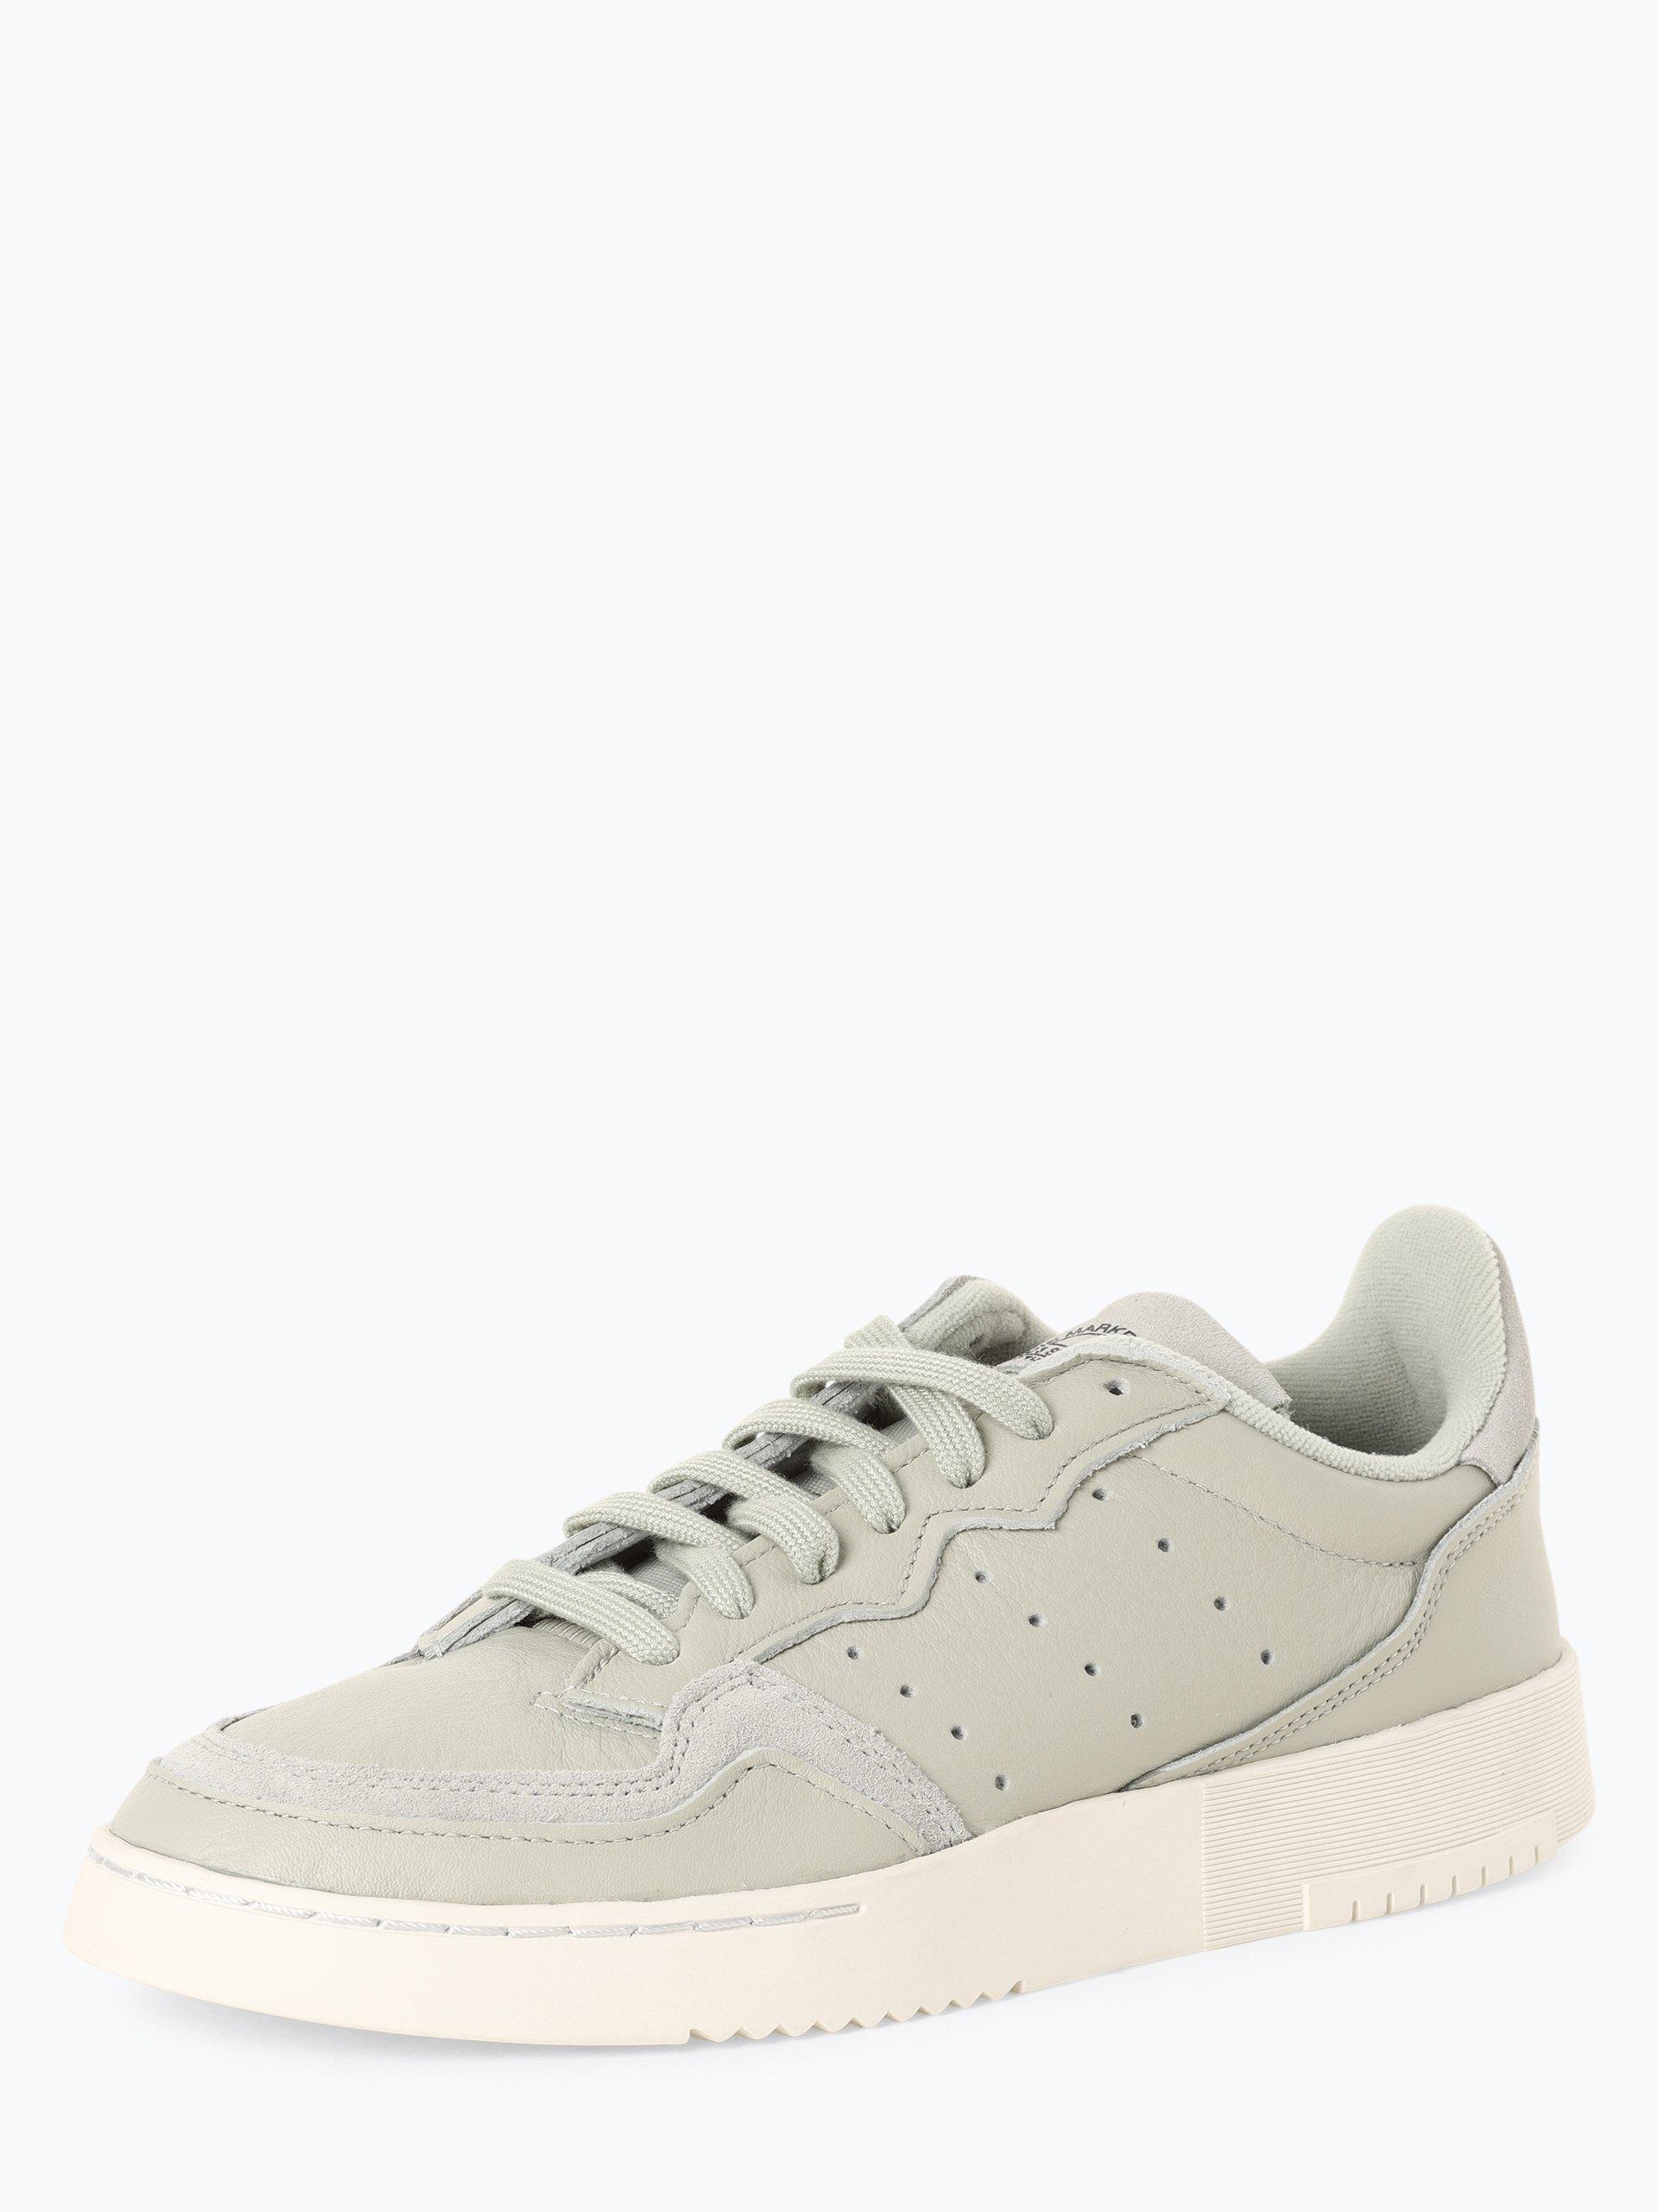 adidas Originals Damen Sneaker aus Leder - Supercourt